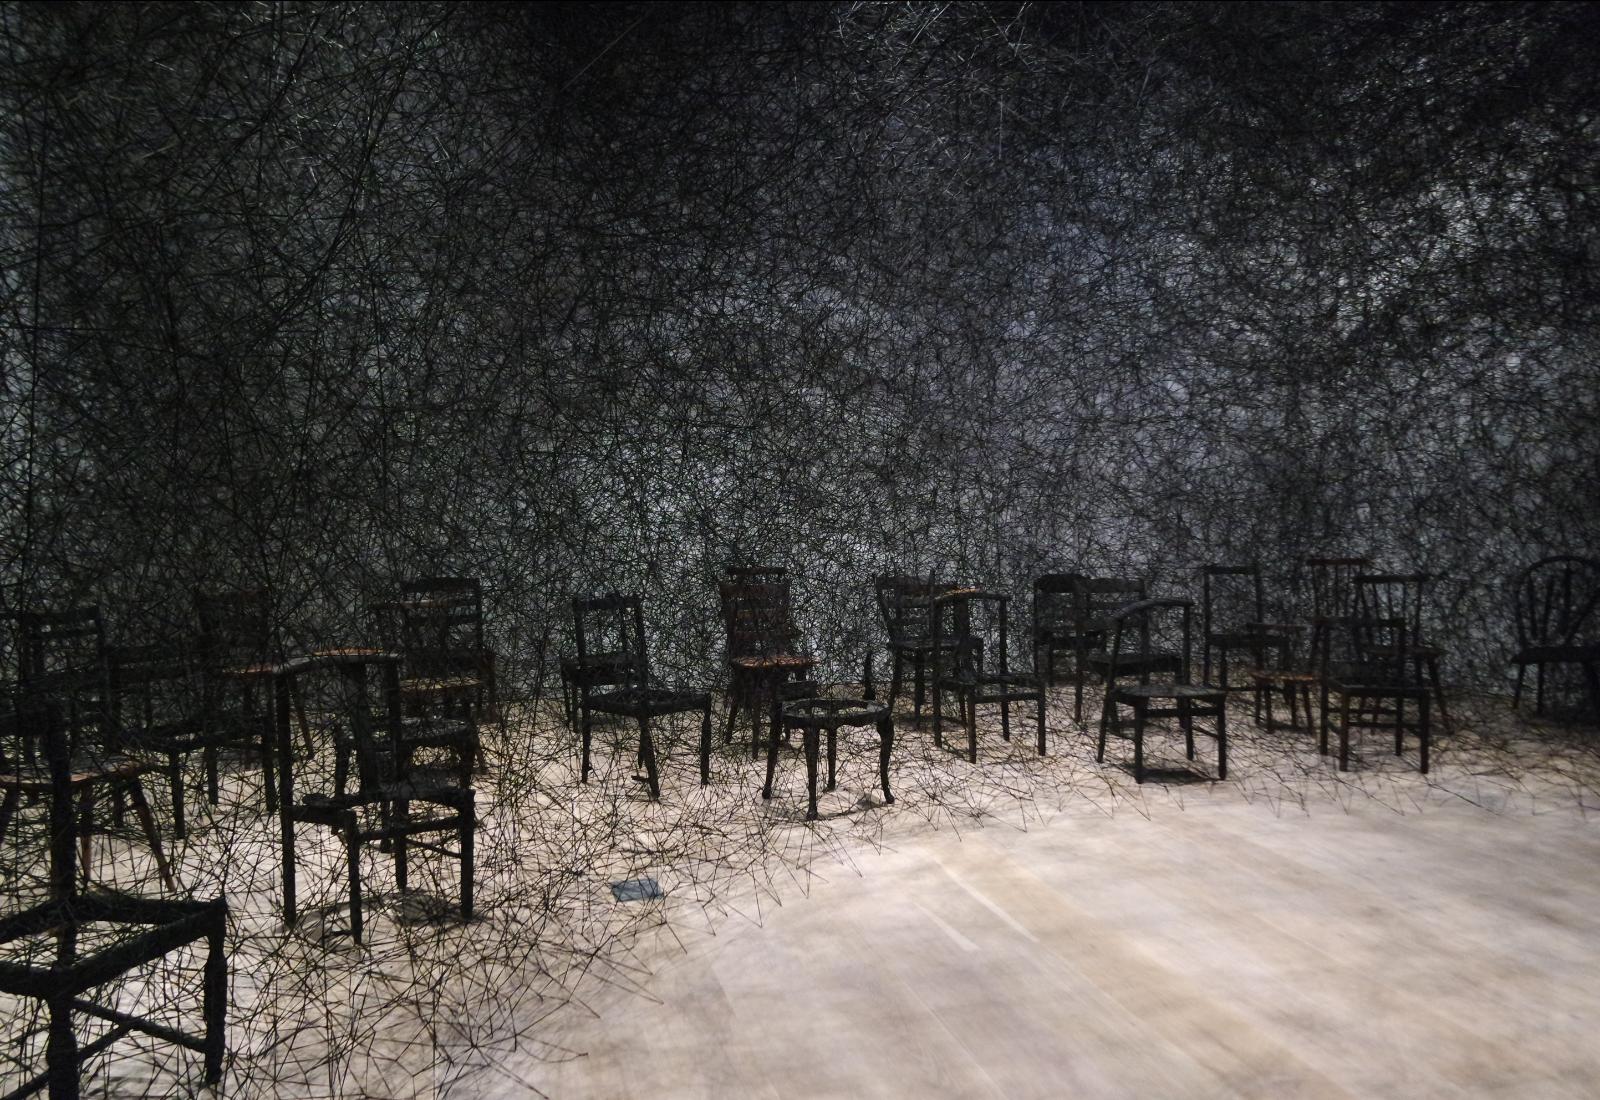 Shiota Chiharu: The Soul Trembles